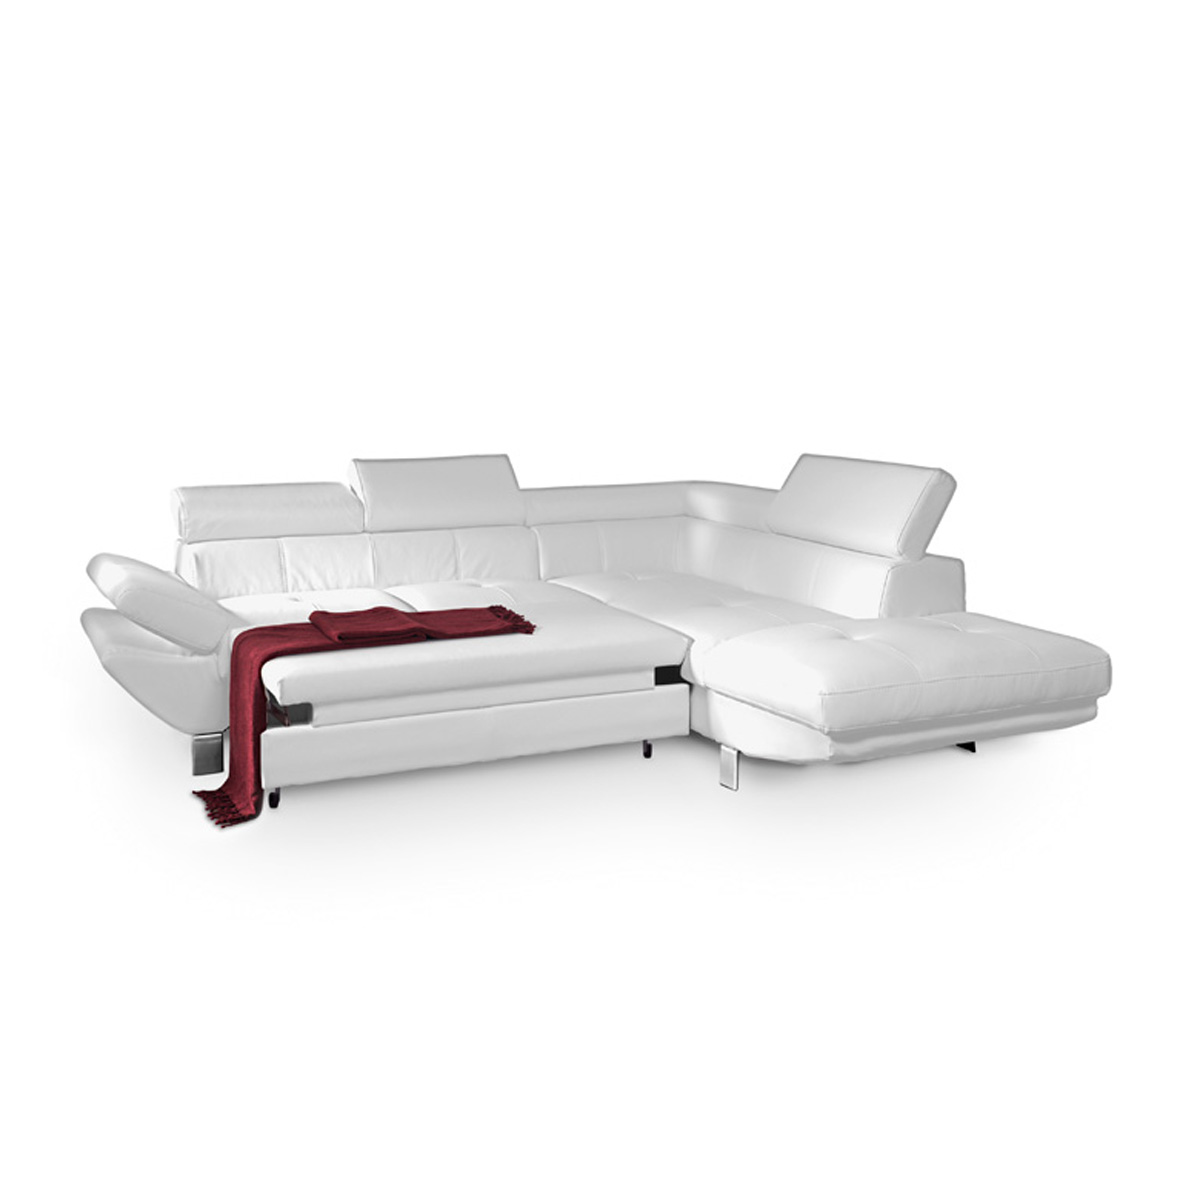 ecksofa carrier wohnlandschaft sofa polsterecke wei. Black Bedroom Furniture Sets. Home Design Ideas